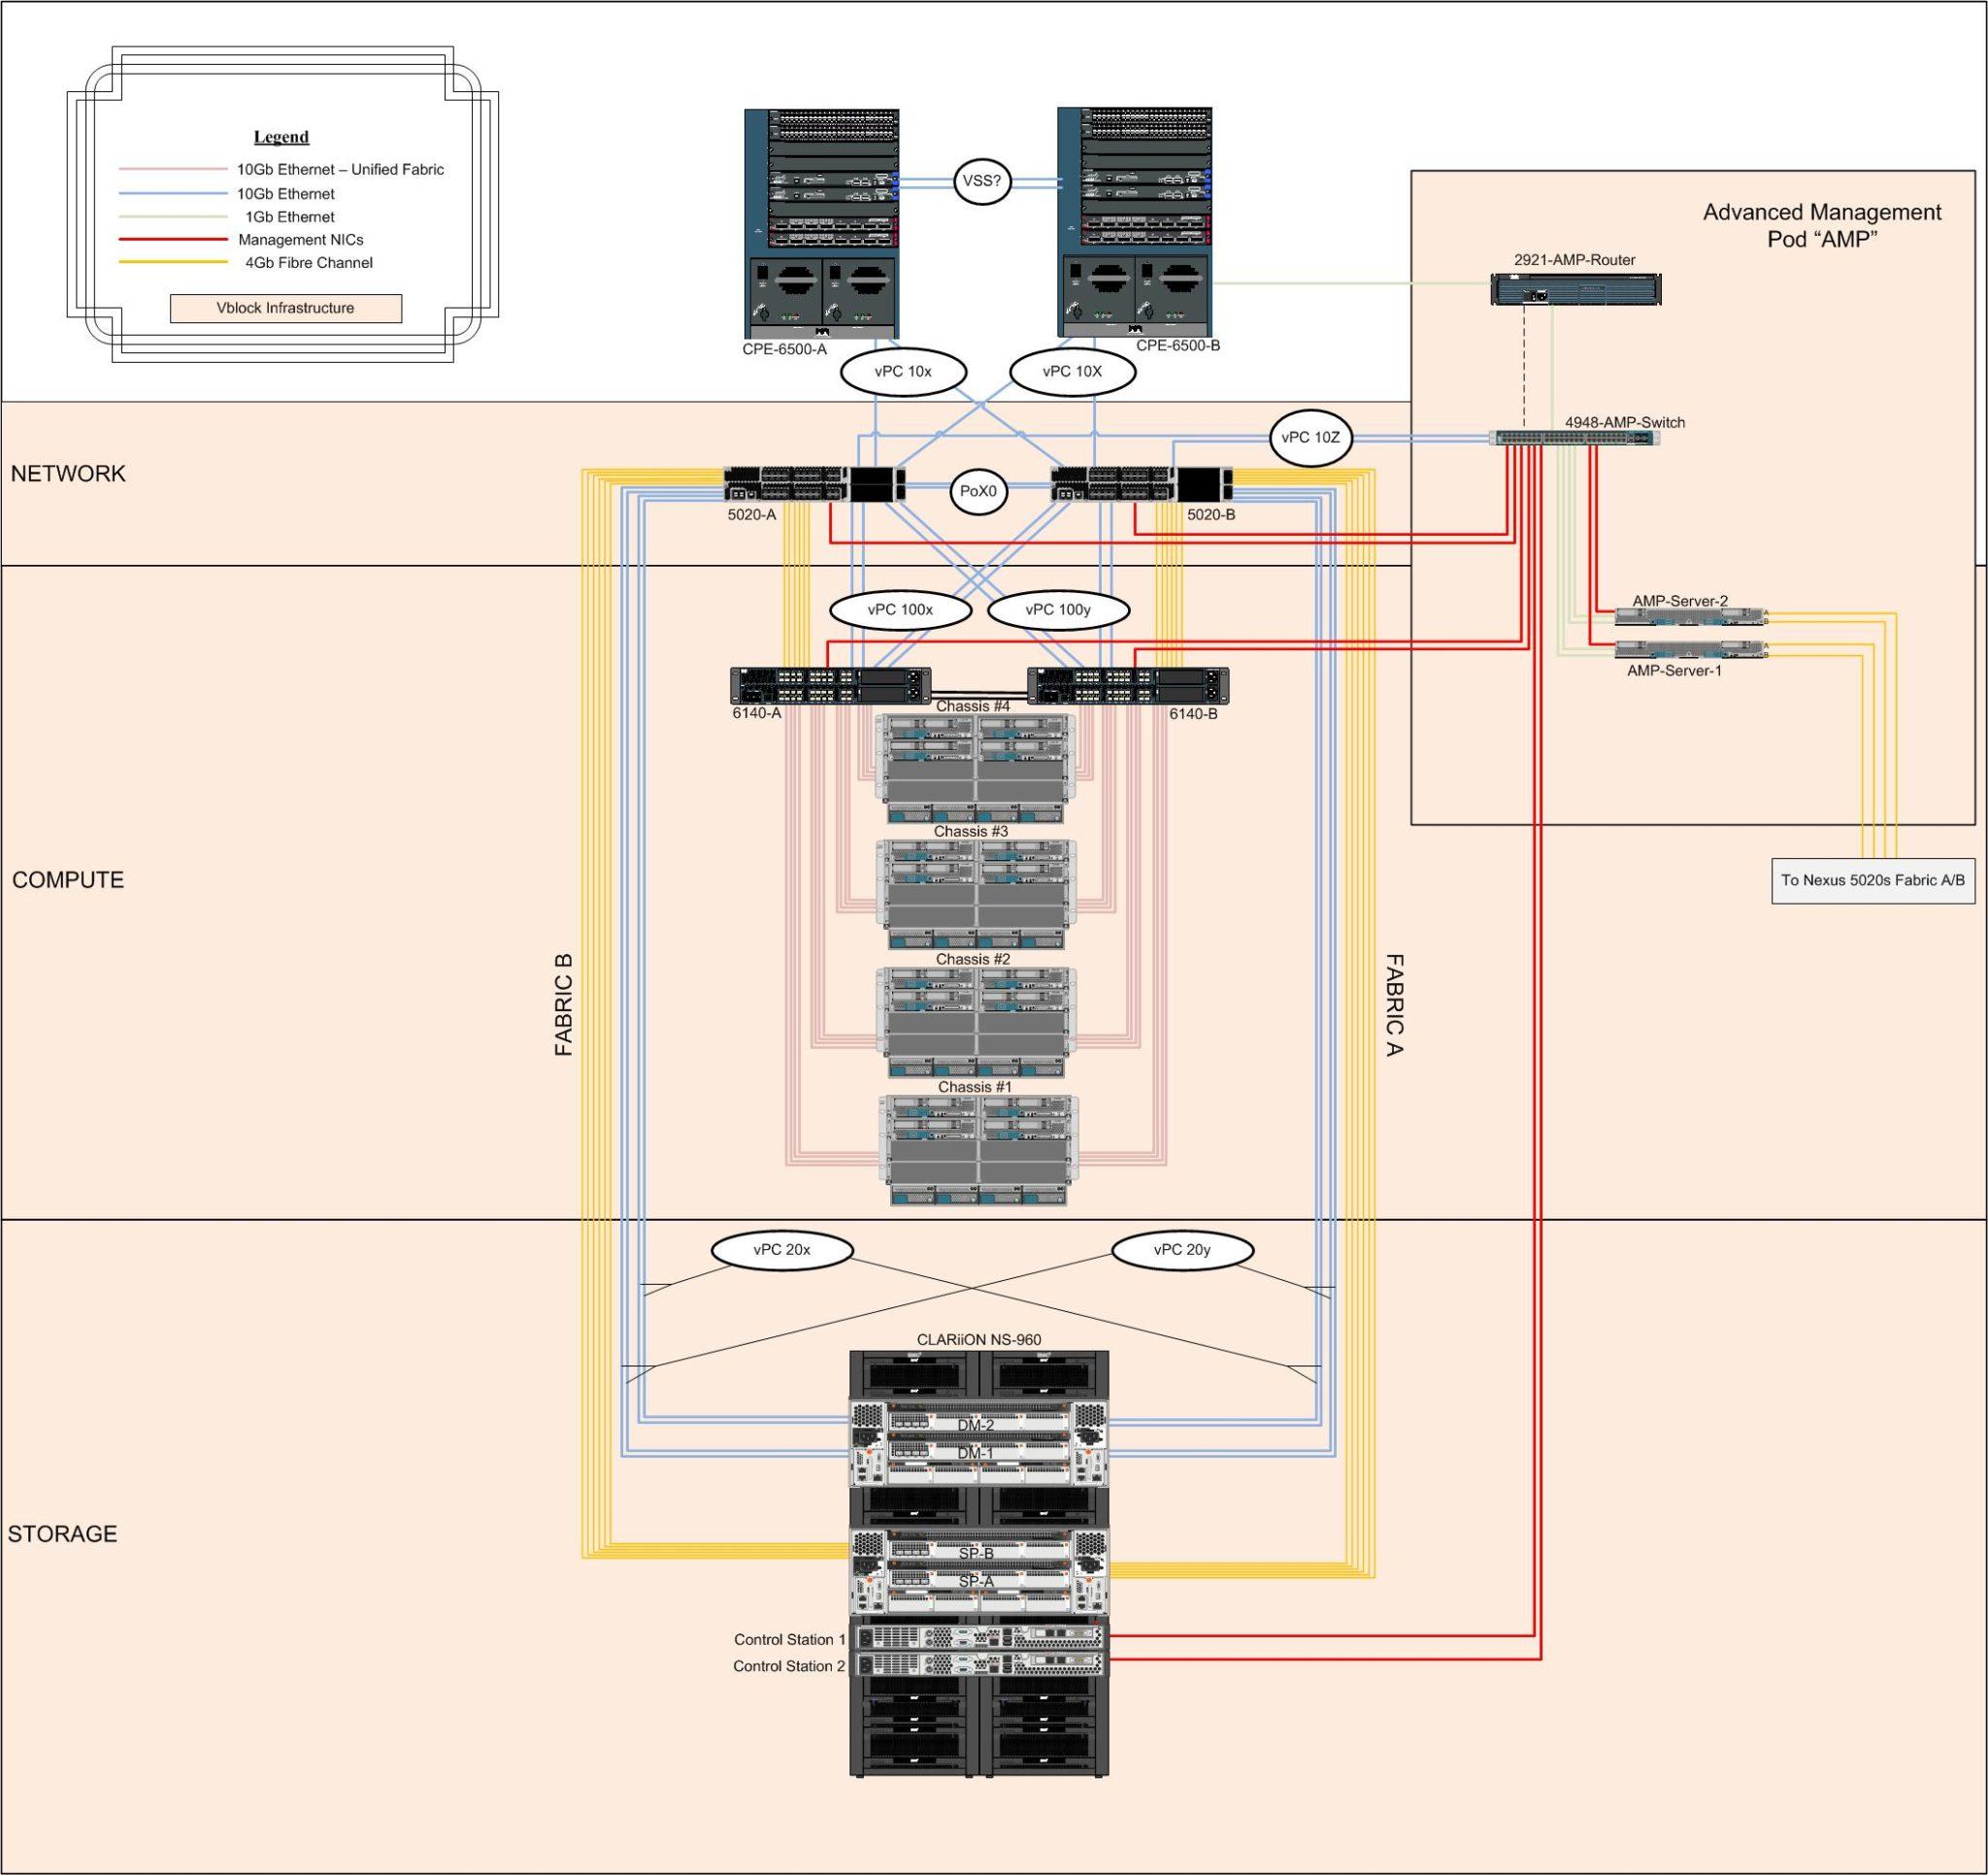 Vmware cluster diagram vmware free engine image for user for Vmware vsphere 6 architecture